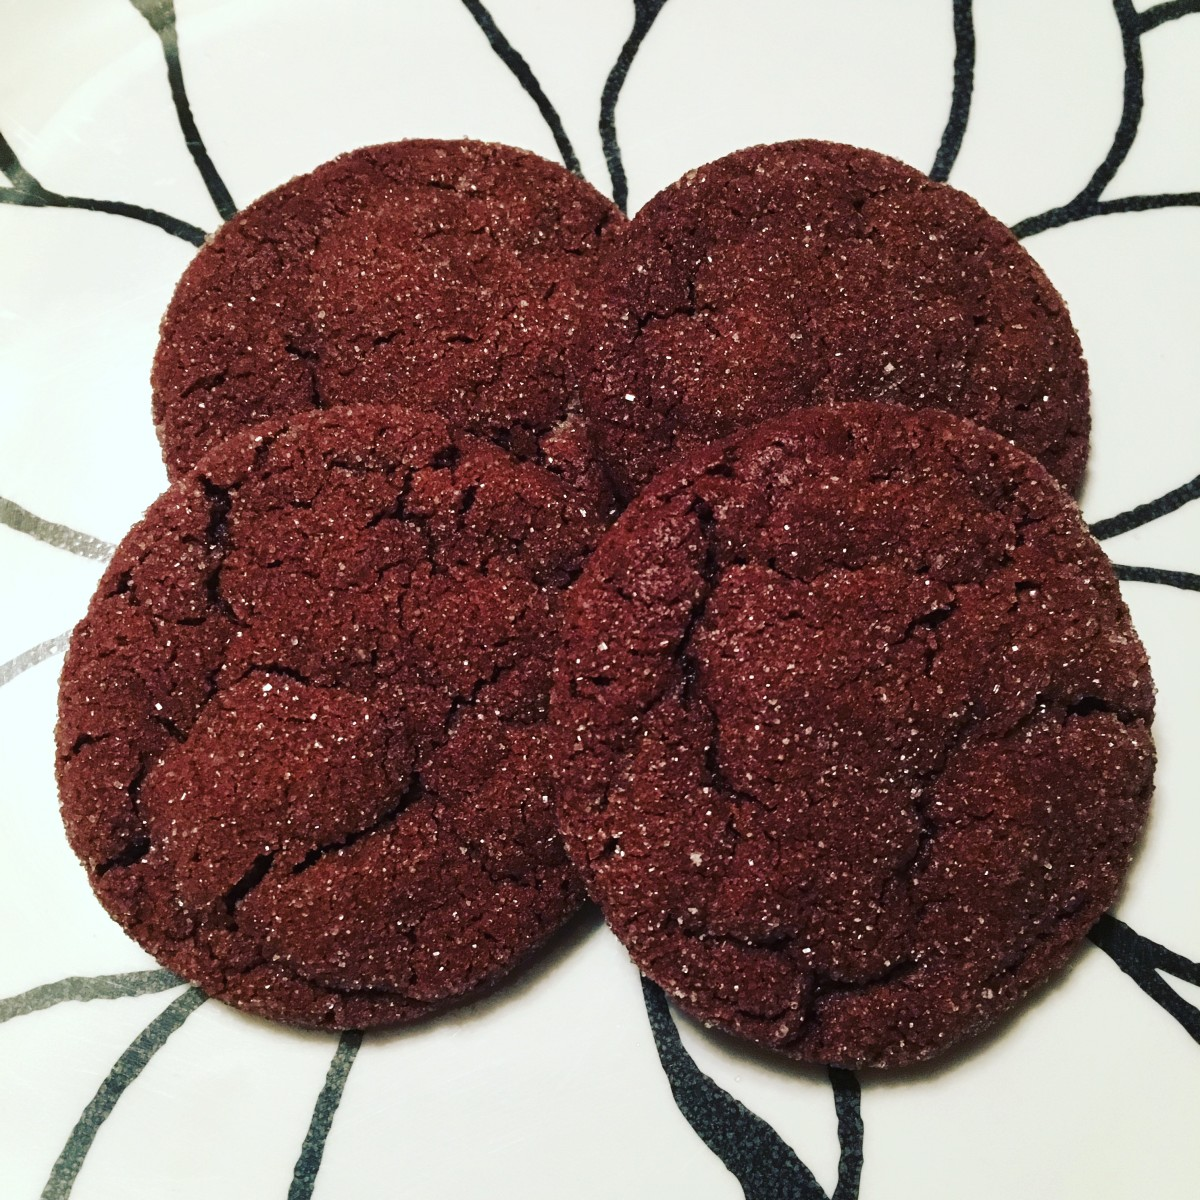 Sugar-Coated Chocolate Cookies